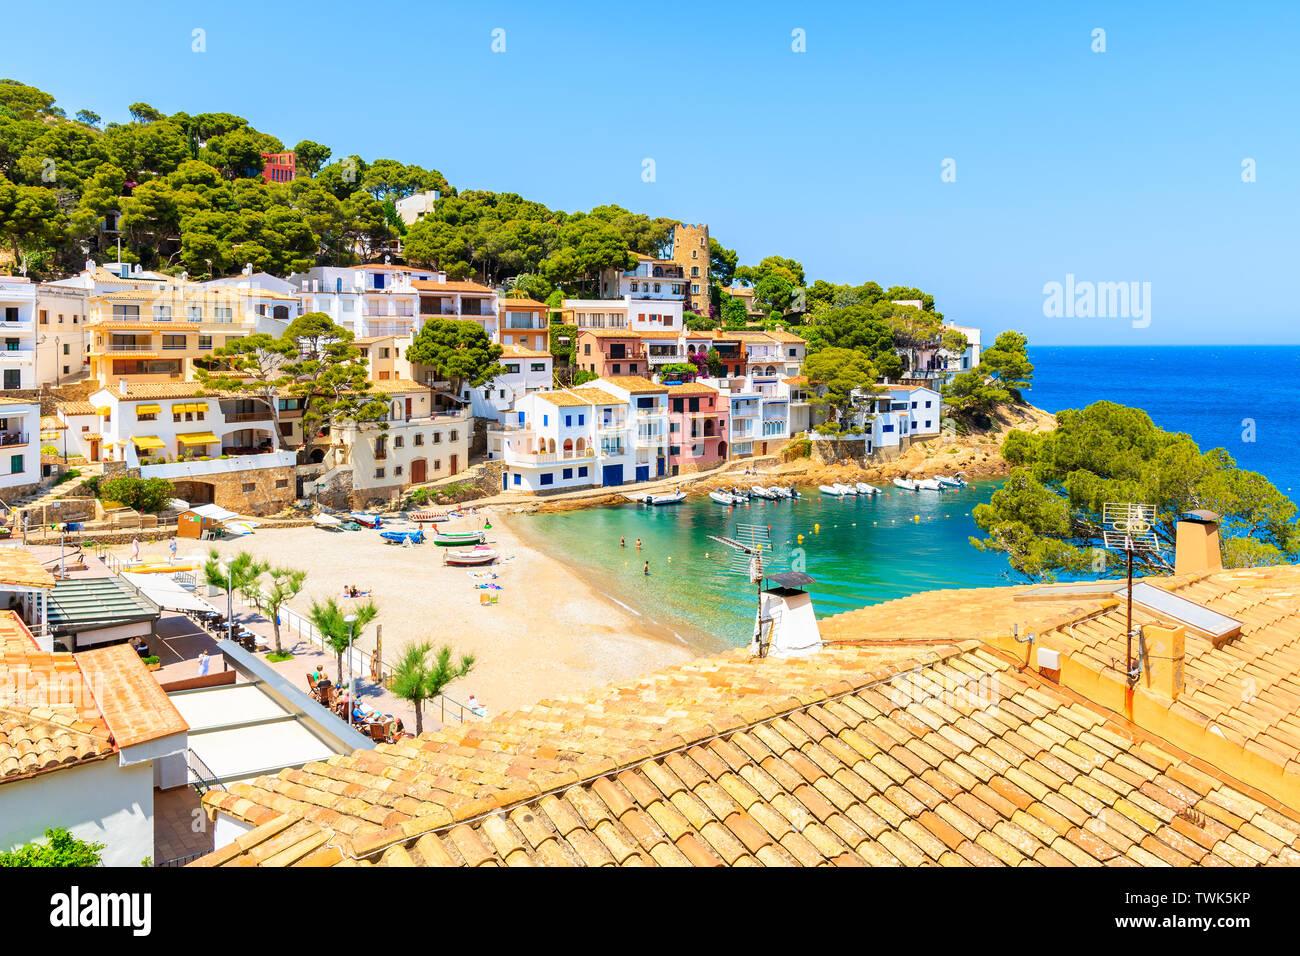 View of colorful houses in sea bay with beach in Sa Tuna coastal village, Costa Brava, Spain Stock Photo